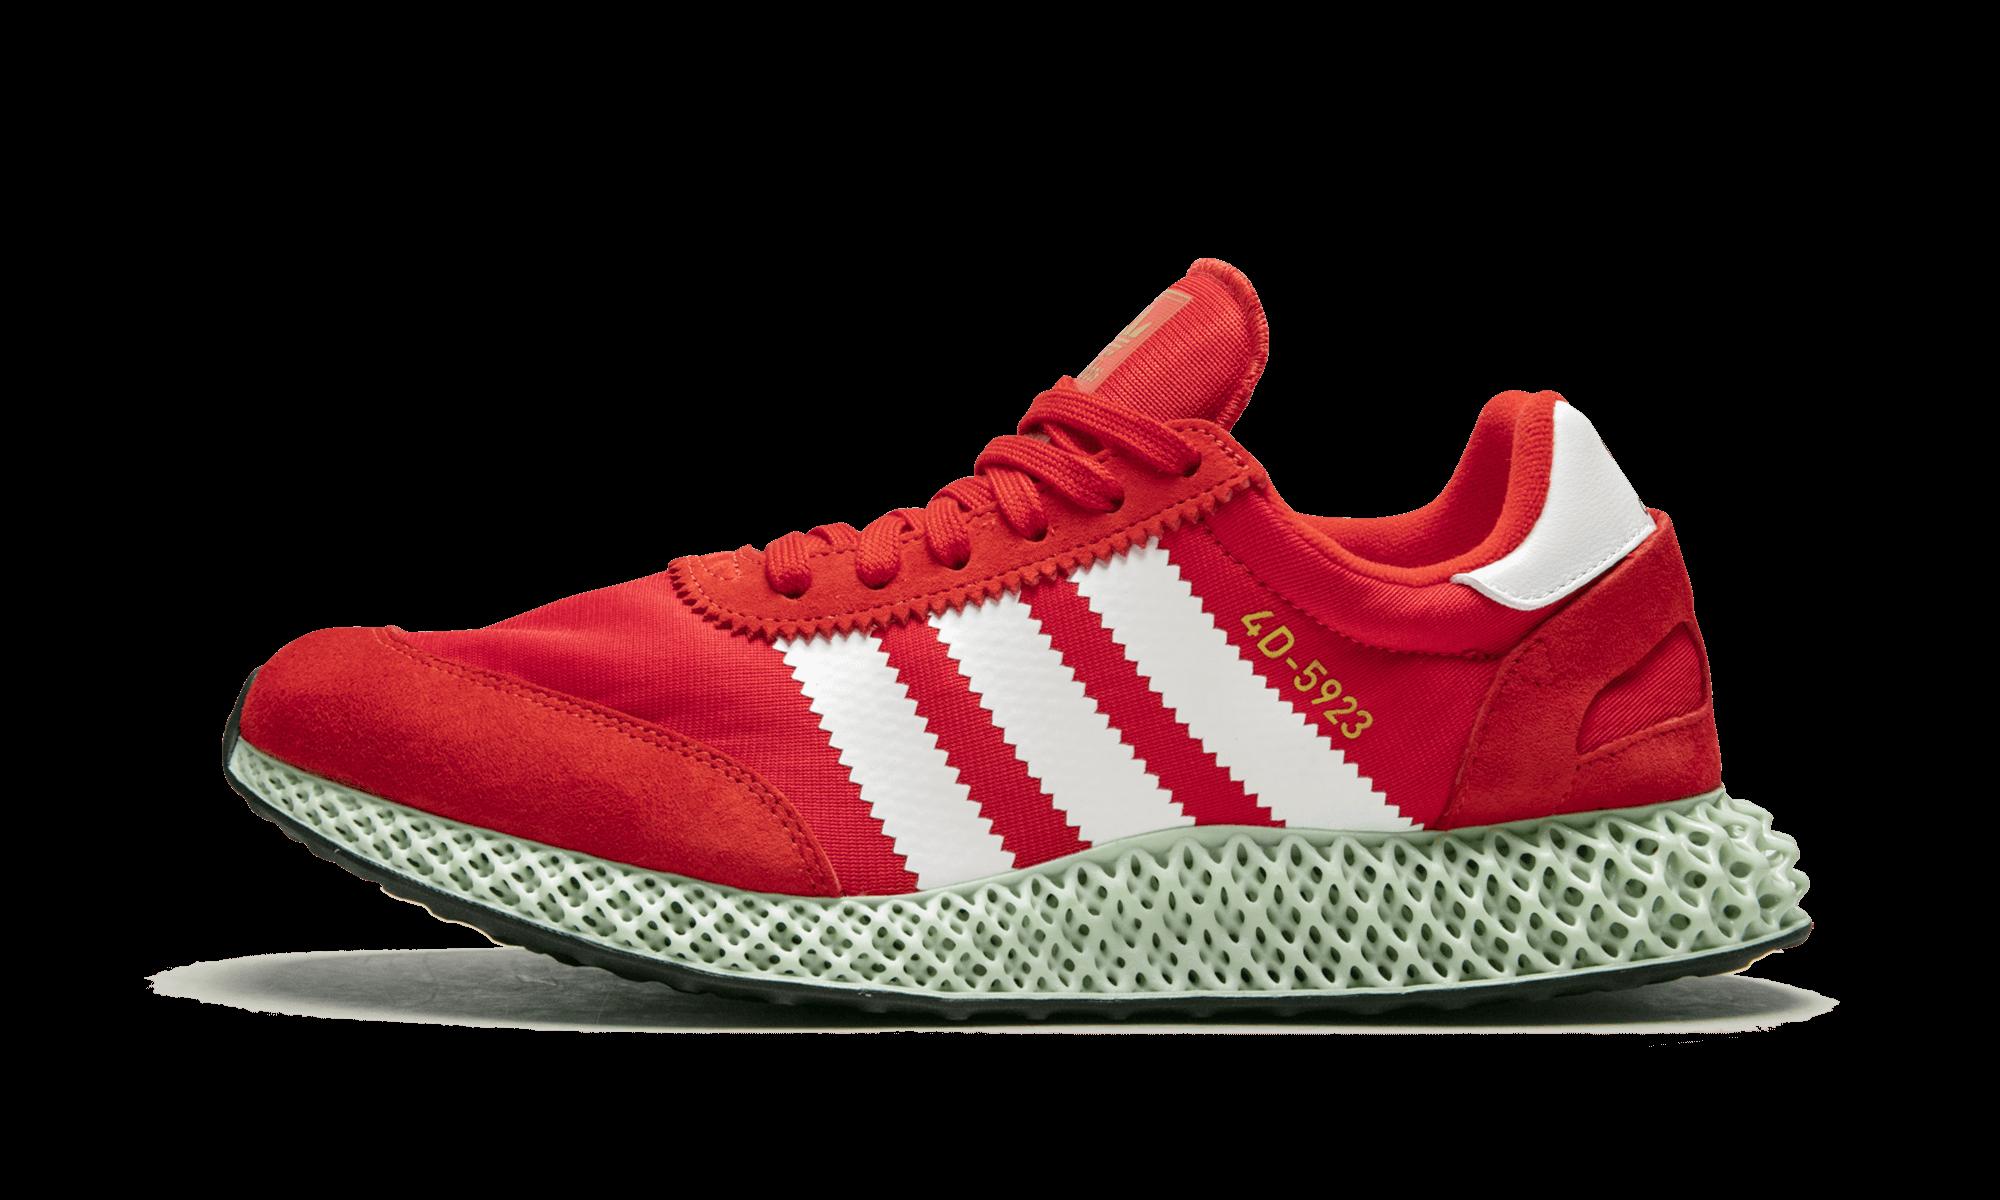 Sneakers men, Adidas iniki runner, Adidas